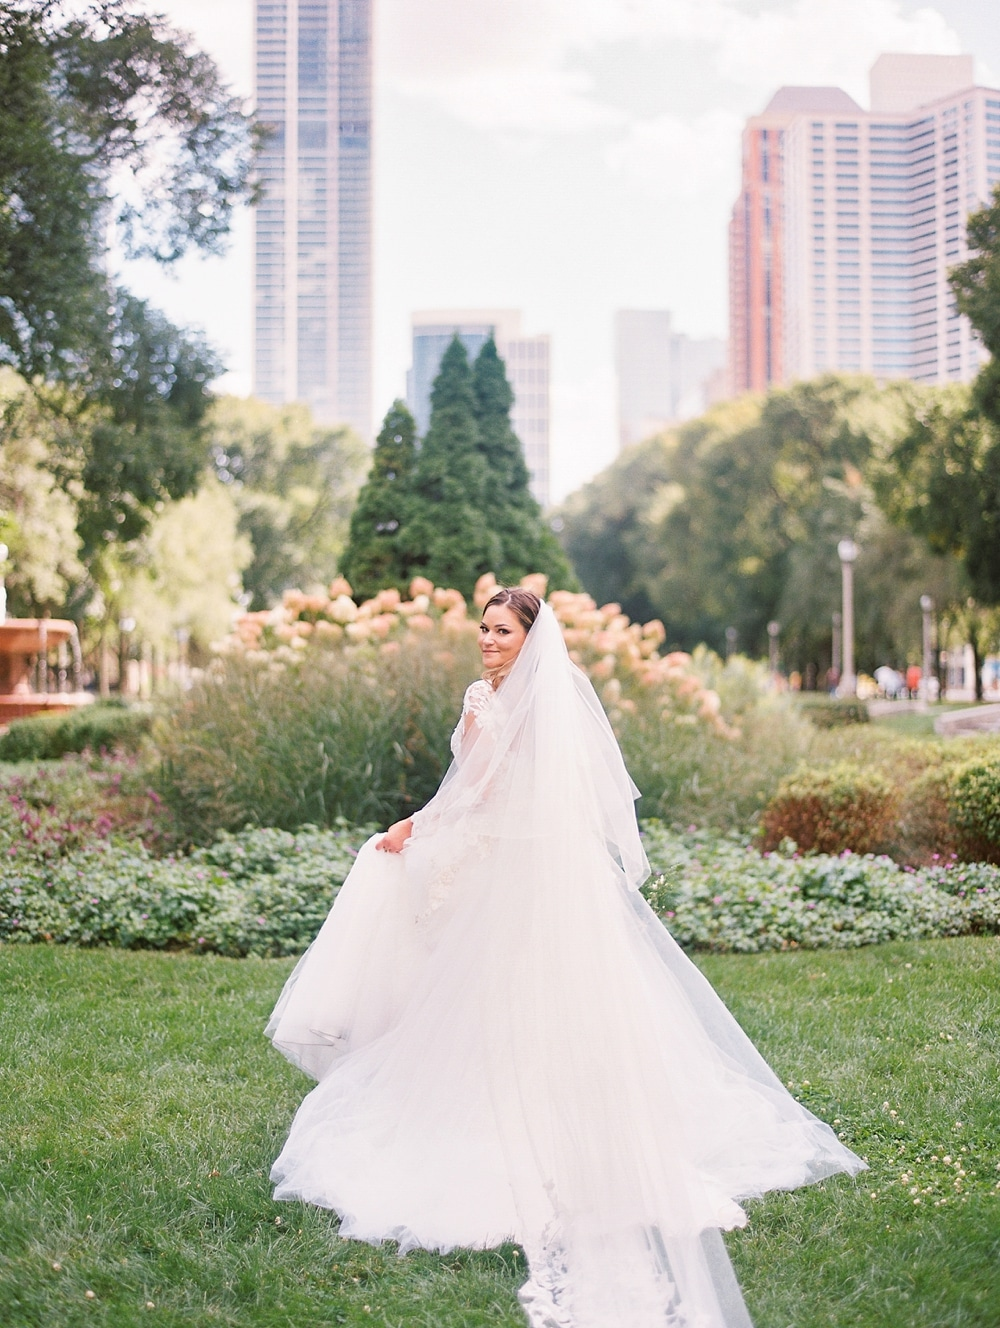 Kristin-La-Voie-Photography-field-museum-chicago-wedding-photos-34